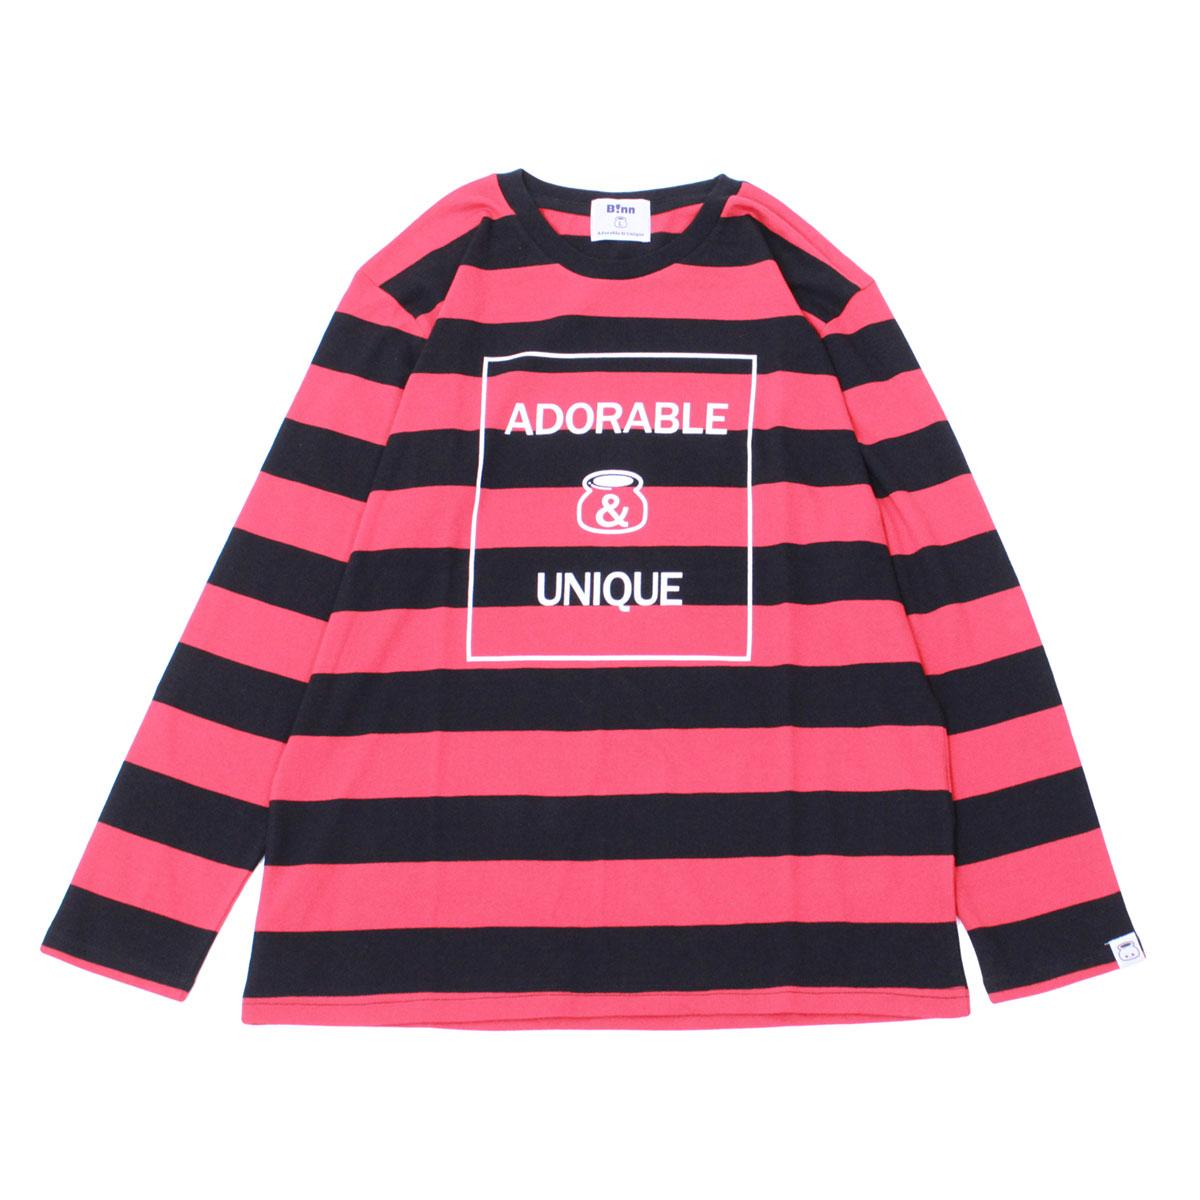 Adorable&Unique Border Long sleeve T (Black x Red)